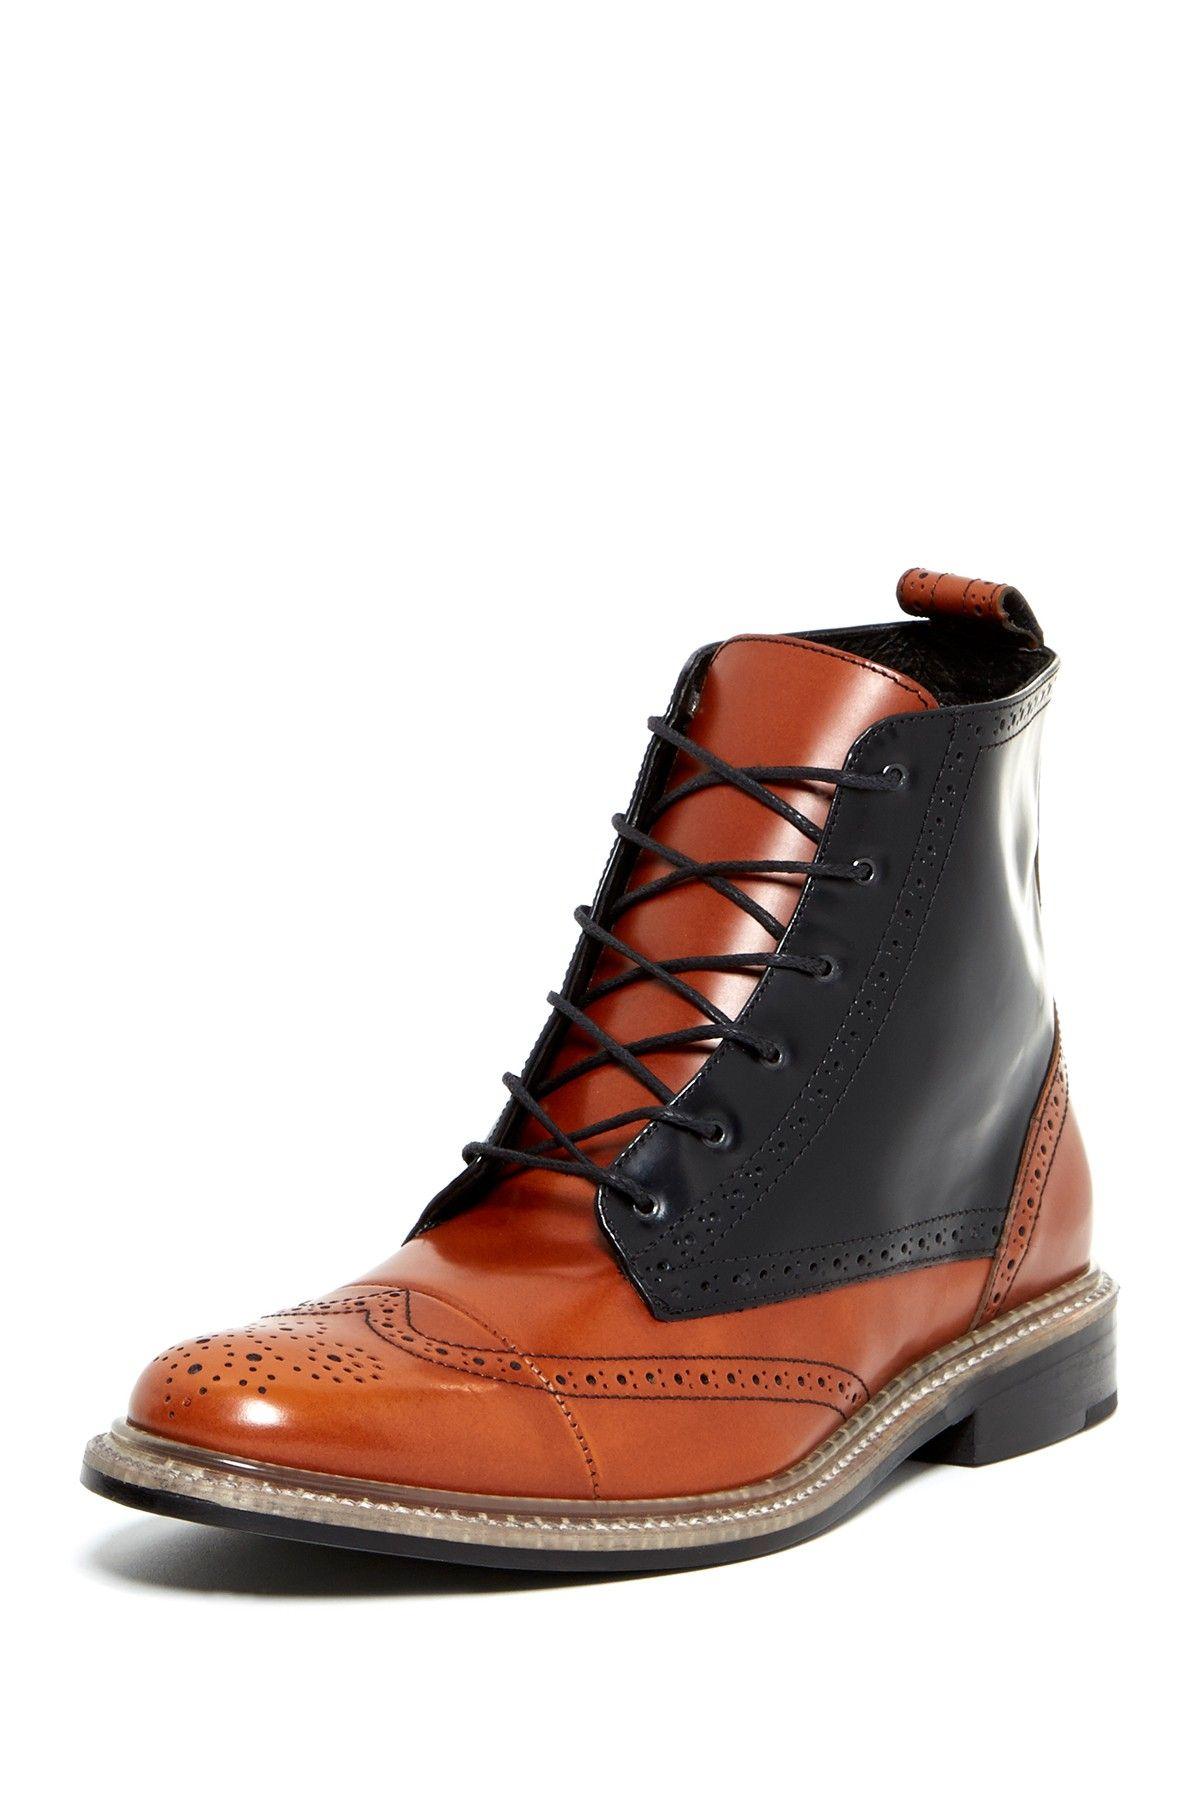 J.D. Fisk Nicholson Wingtip LaceUp Boot Mens boots